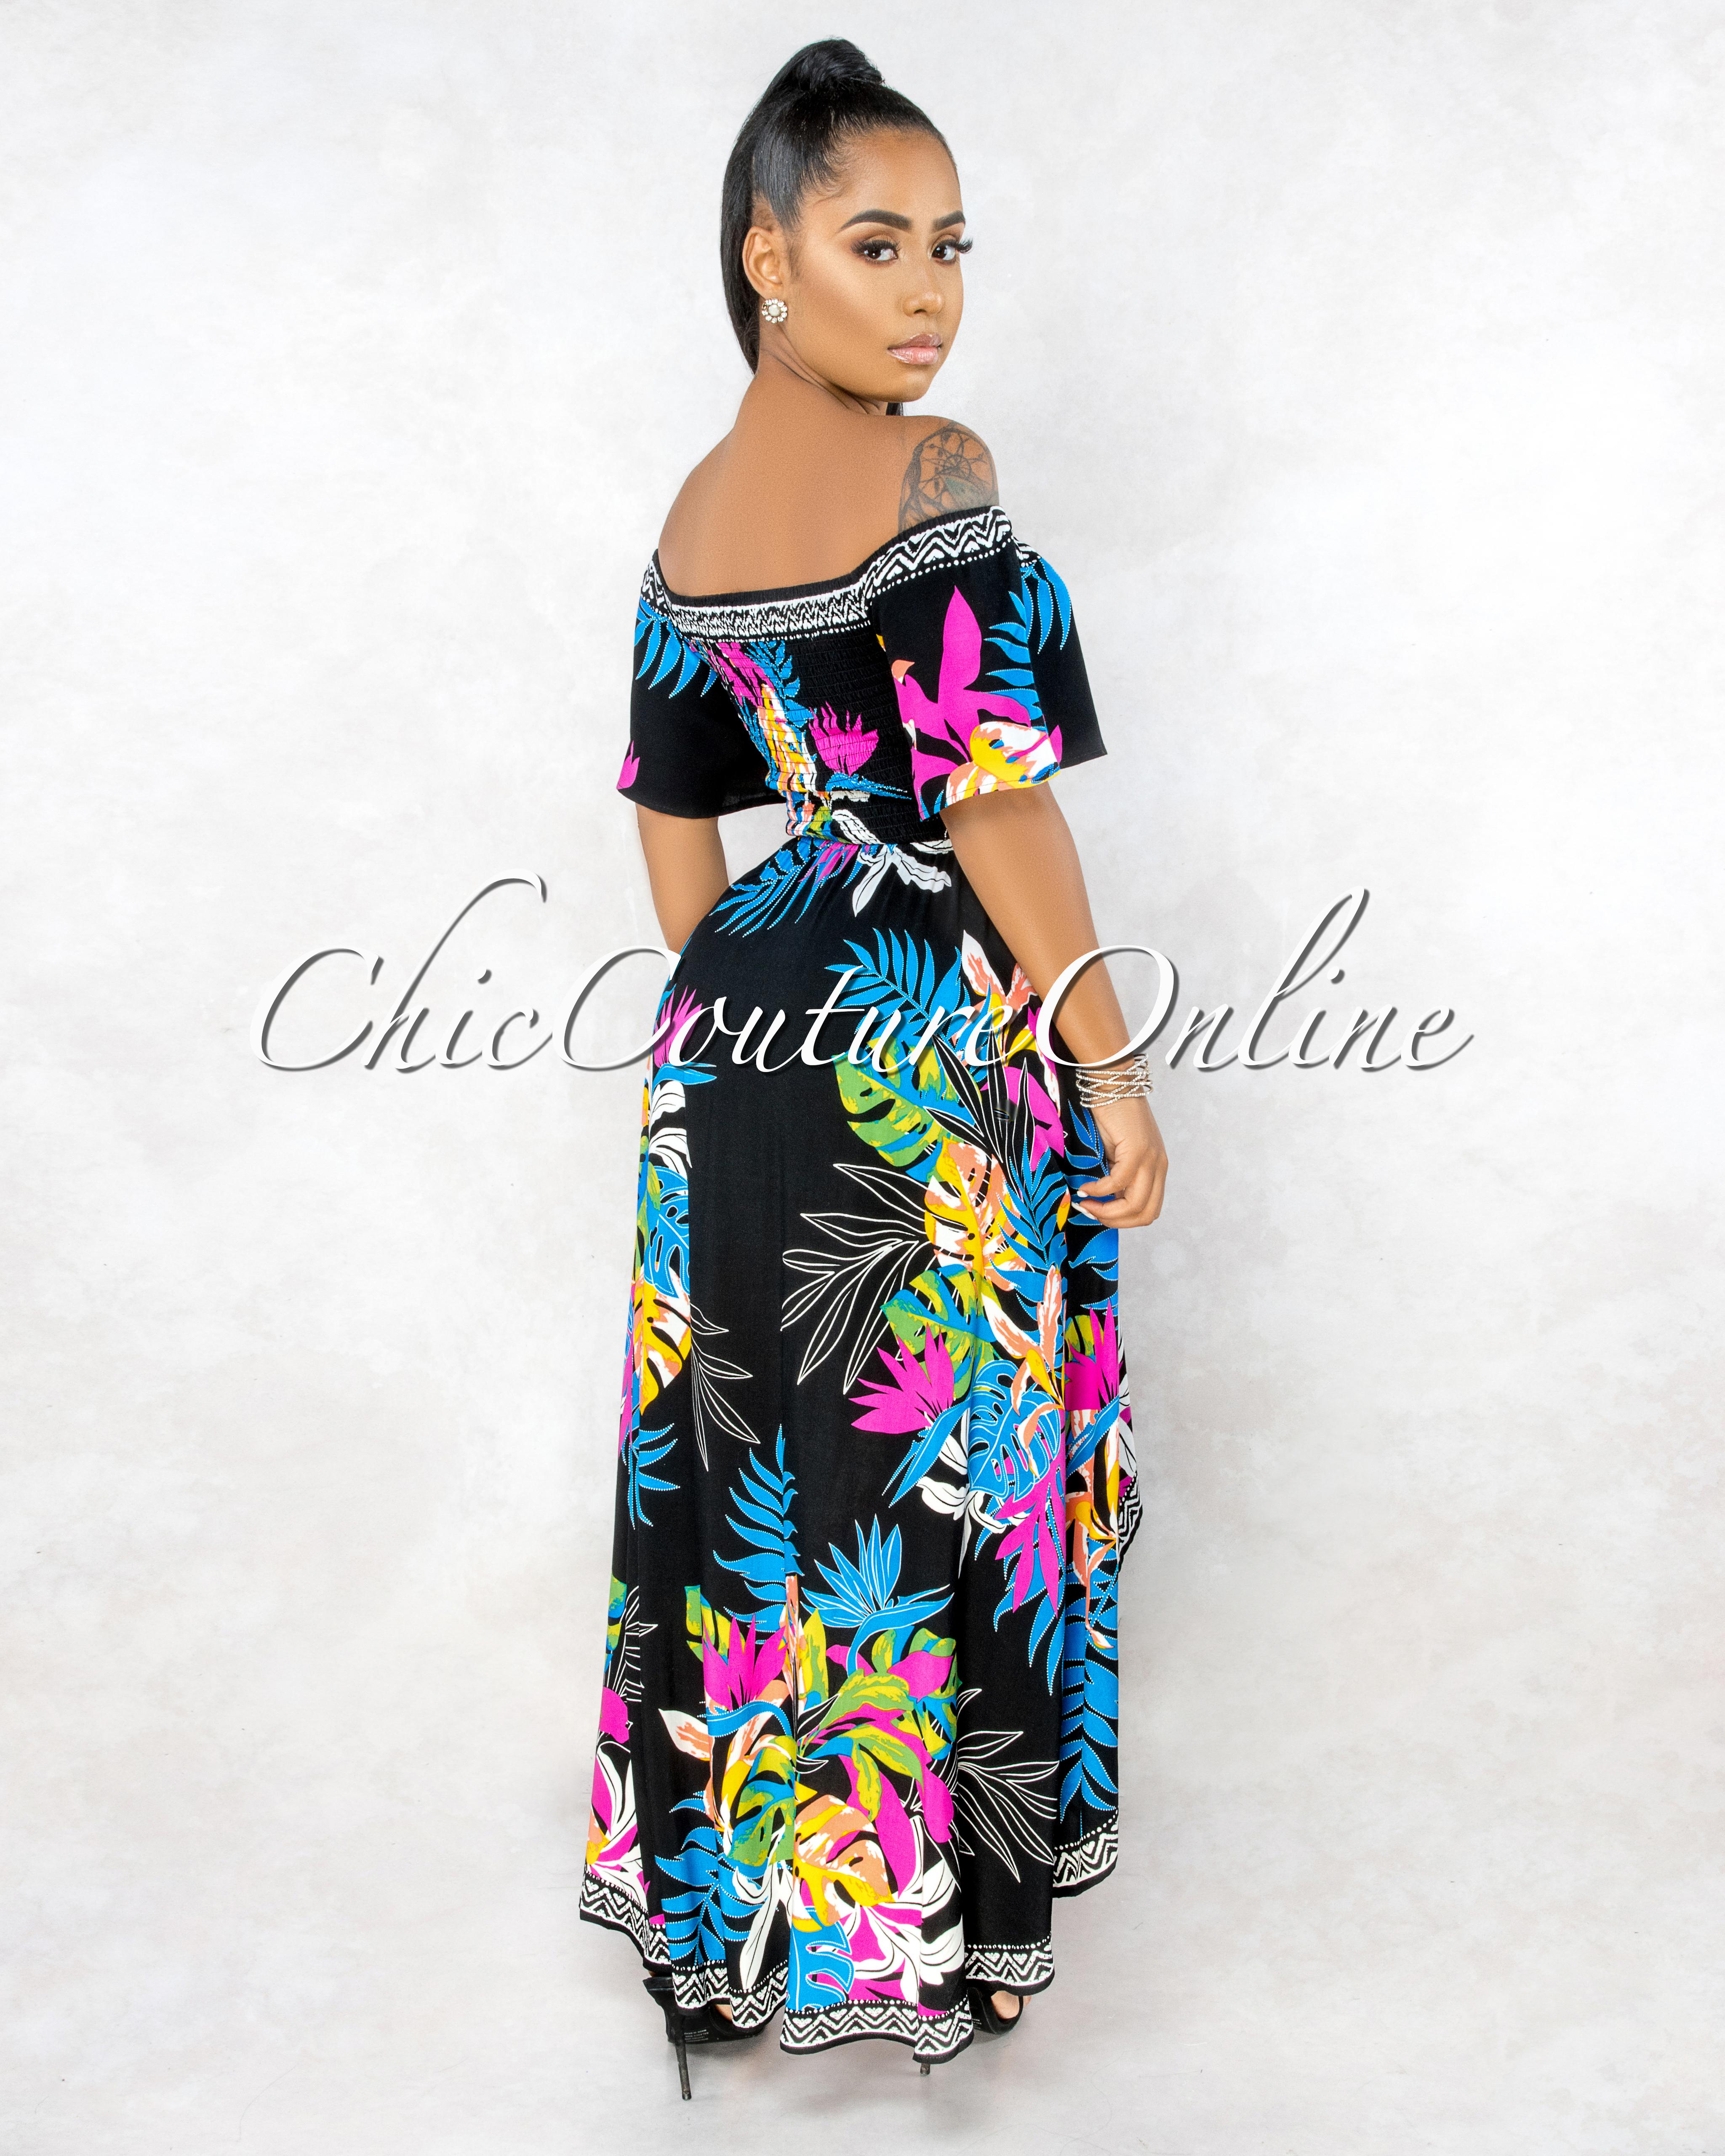 Yalena Black Floral Smocked Top High-Low Maxi Dress